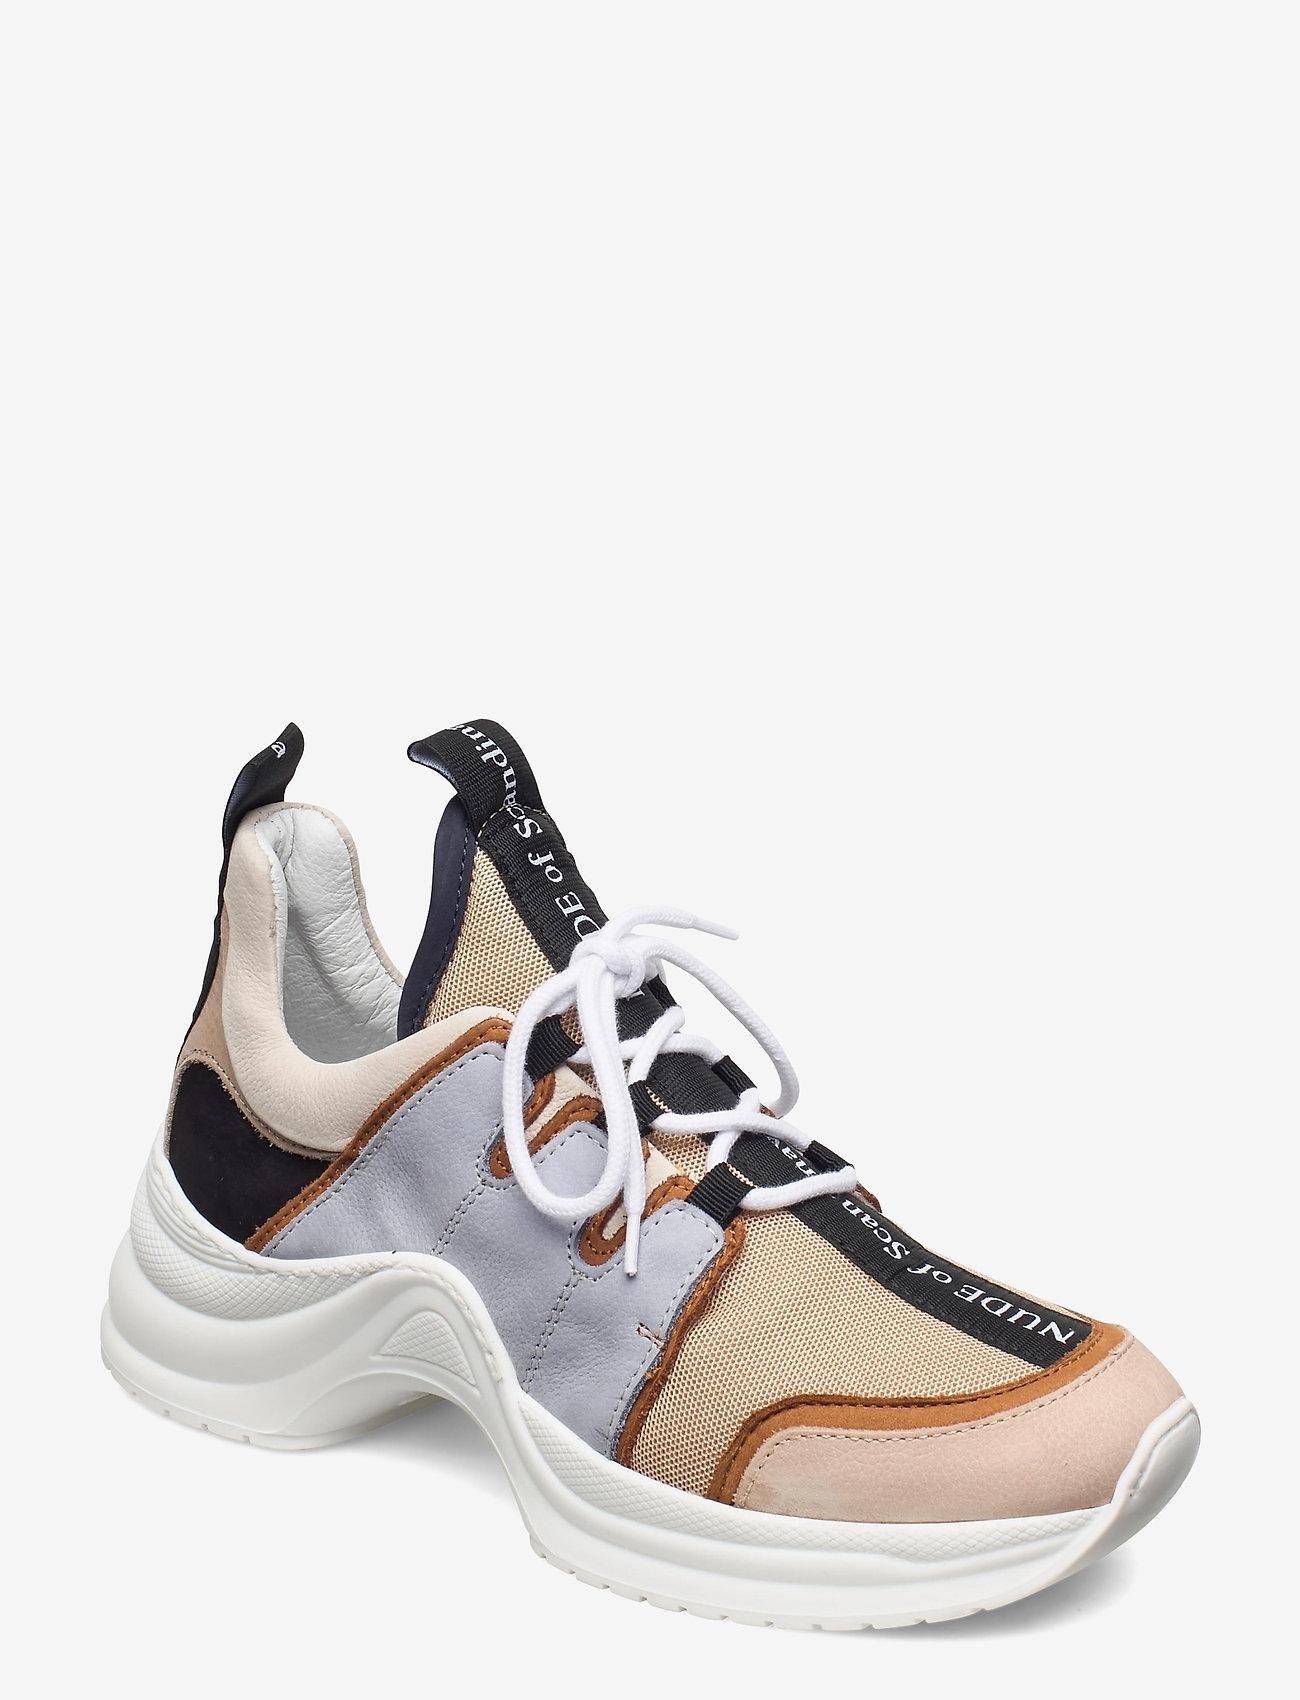 Nude of Scandinavia - JOY - chunky sneakers - mix / polvere - 0